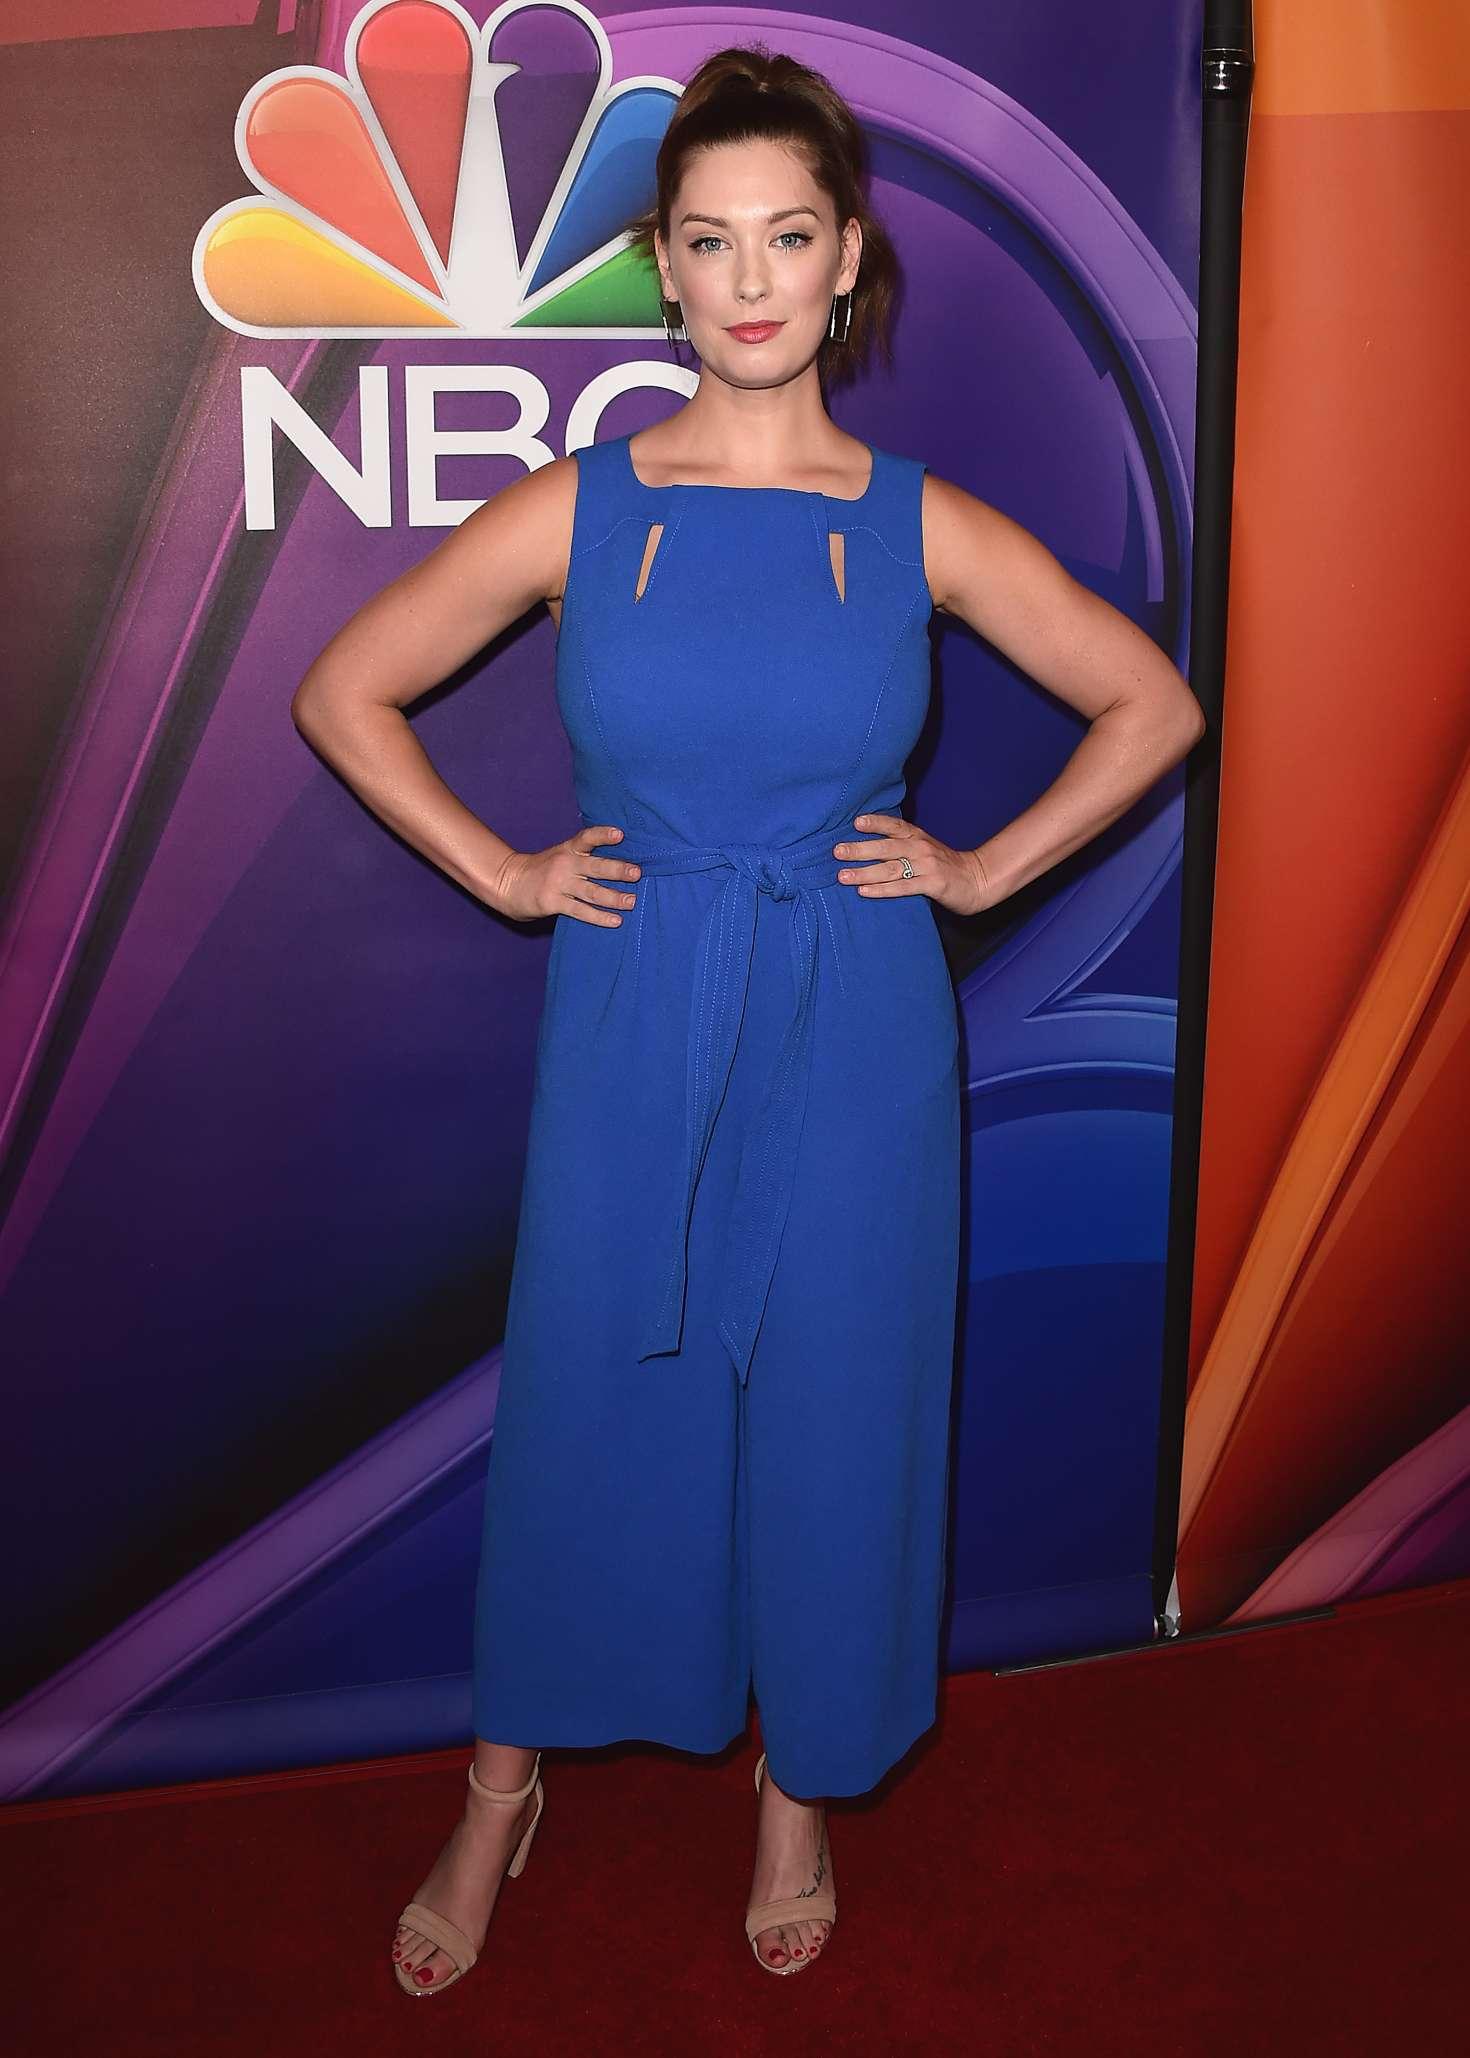 Briga Heelan 2017 : Briga Heelan: 2017 NBC Summer TCA Press Tour -04